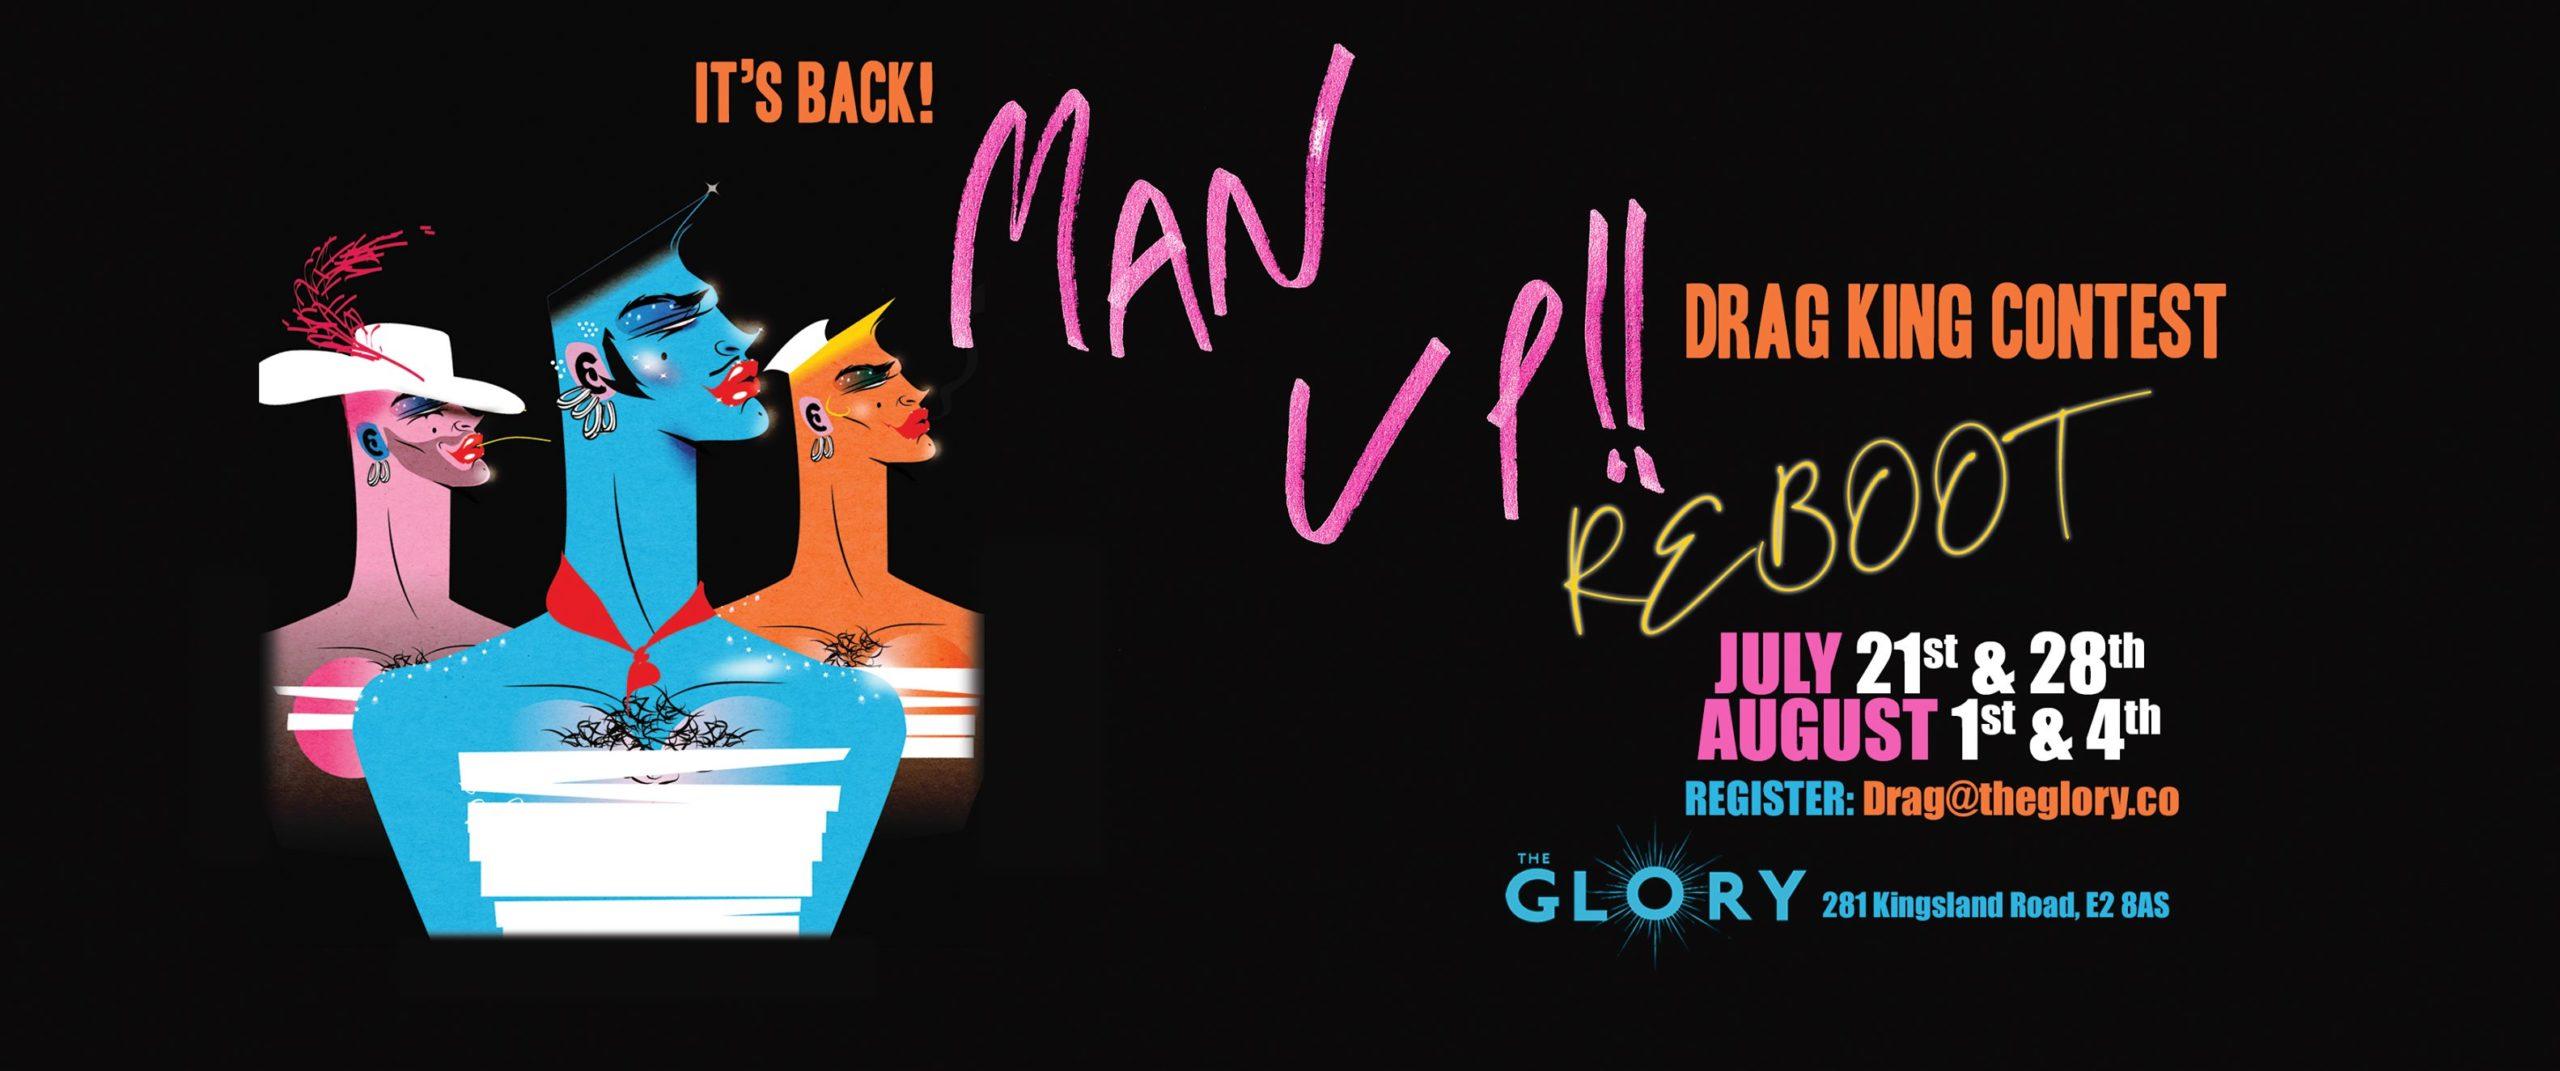 Man Up! Drag King Contest – Heat 9